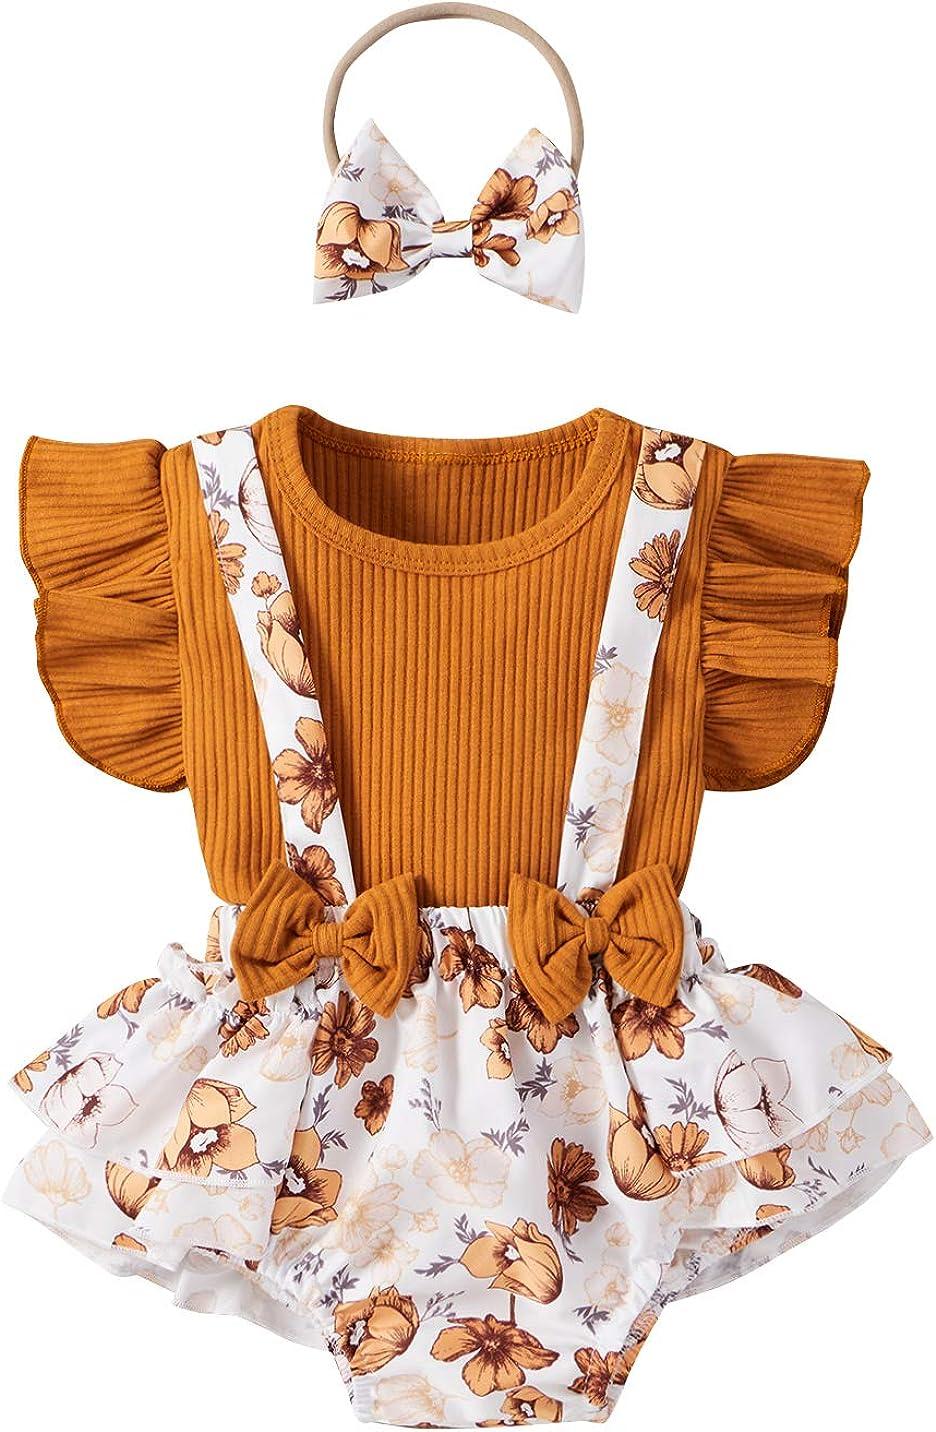 Baby Girl Summer Clothes Set Ruffle Flying Sleeve Rib Knitted Romper Floral Suspender Shorts Headband 3PCS Set